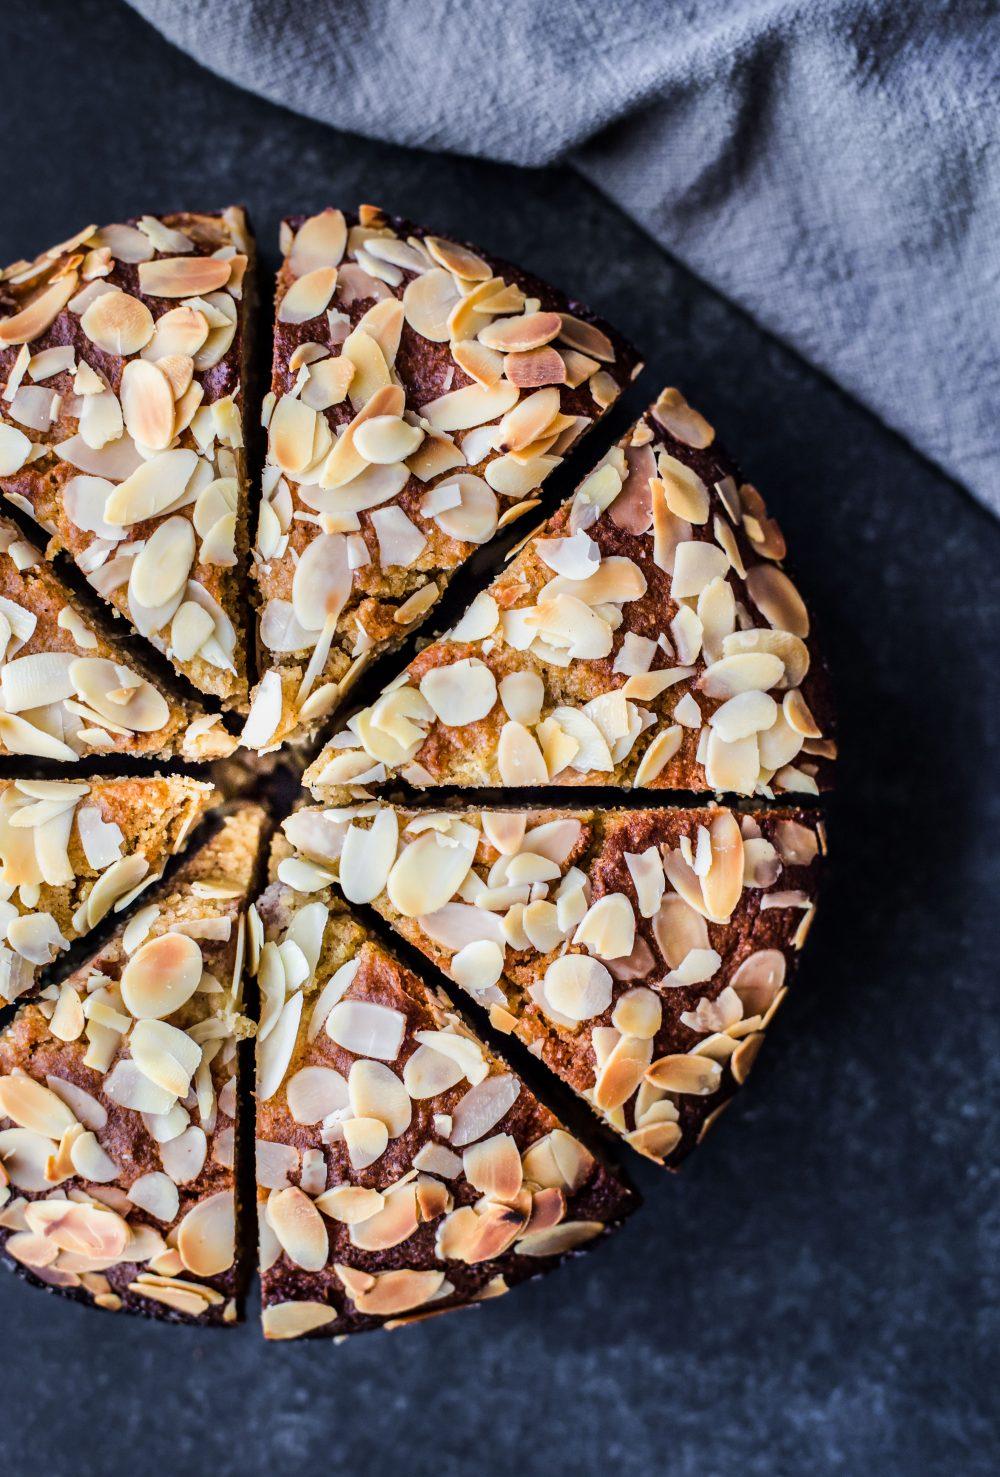 pear-almond-cake-gluten-free-delicious-traditional-baking-dairy-free-vegetarian-fruit